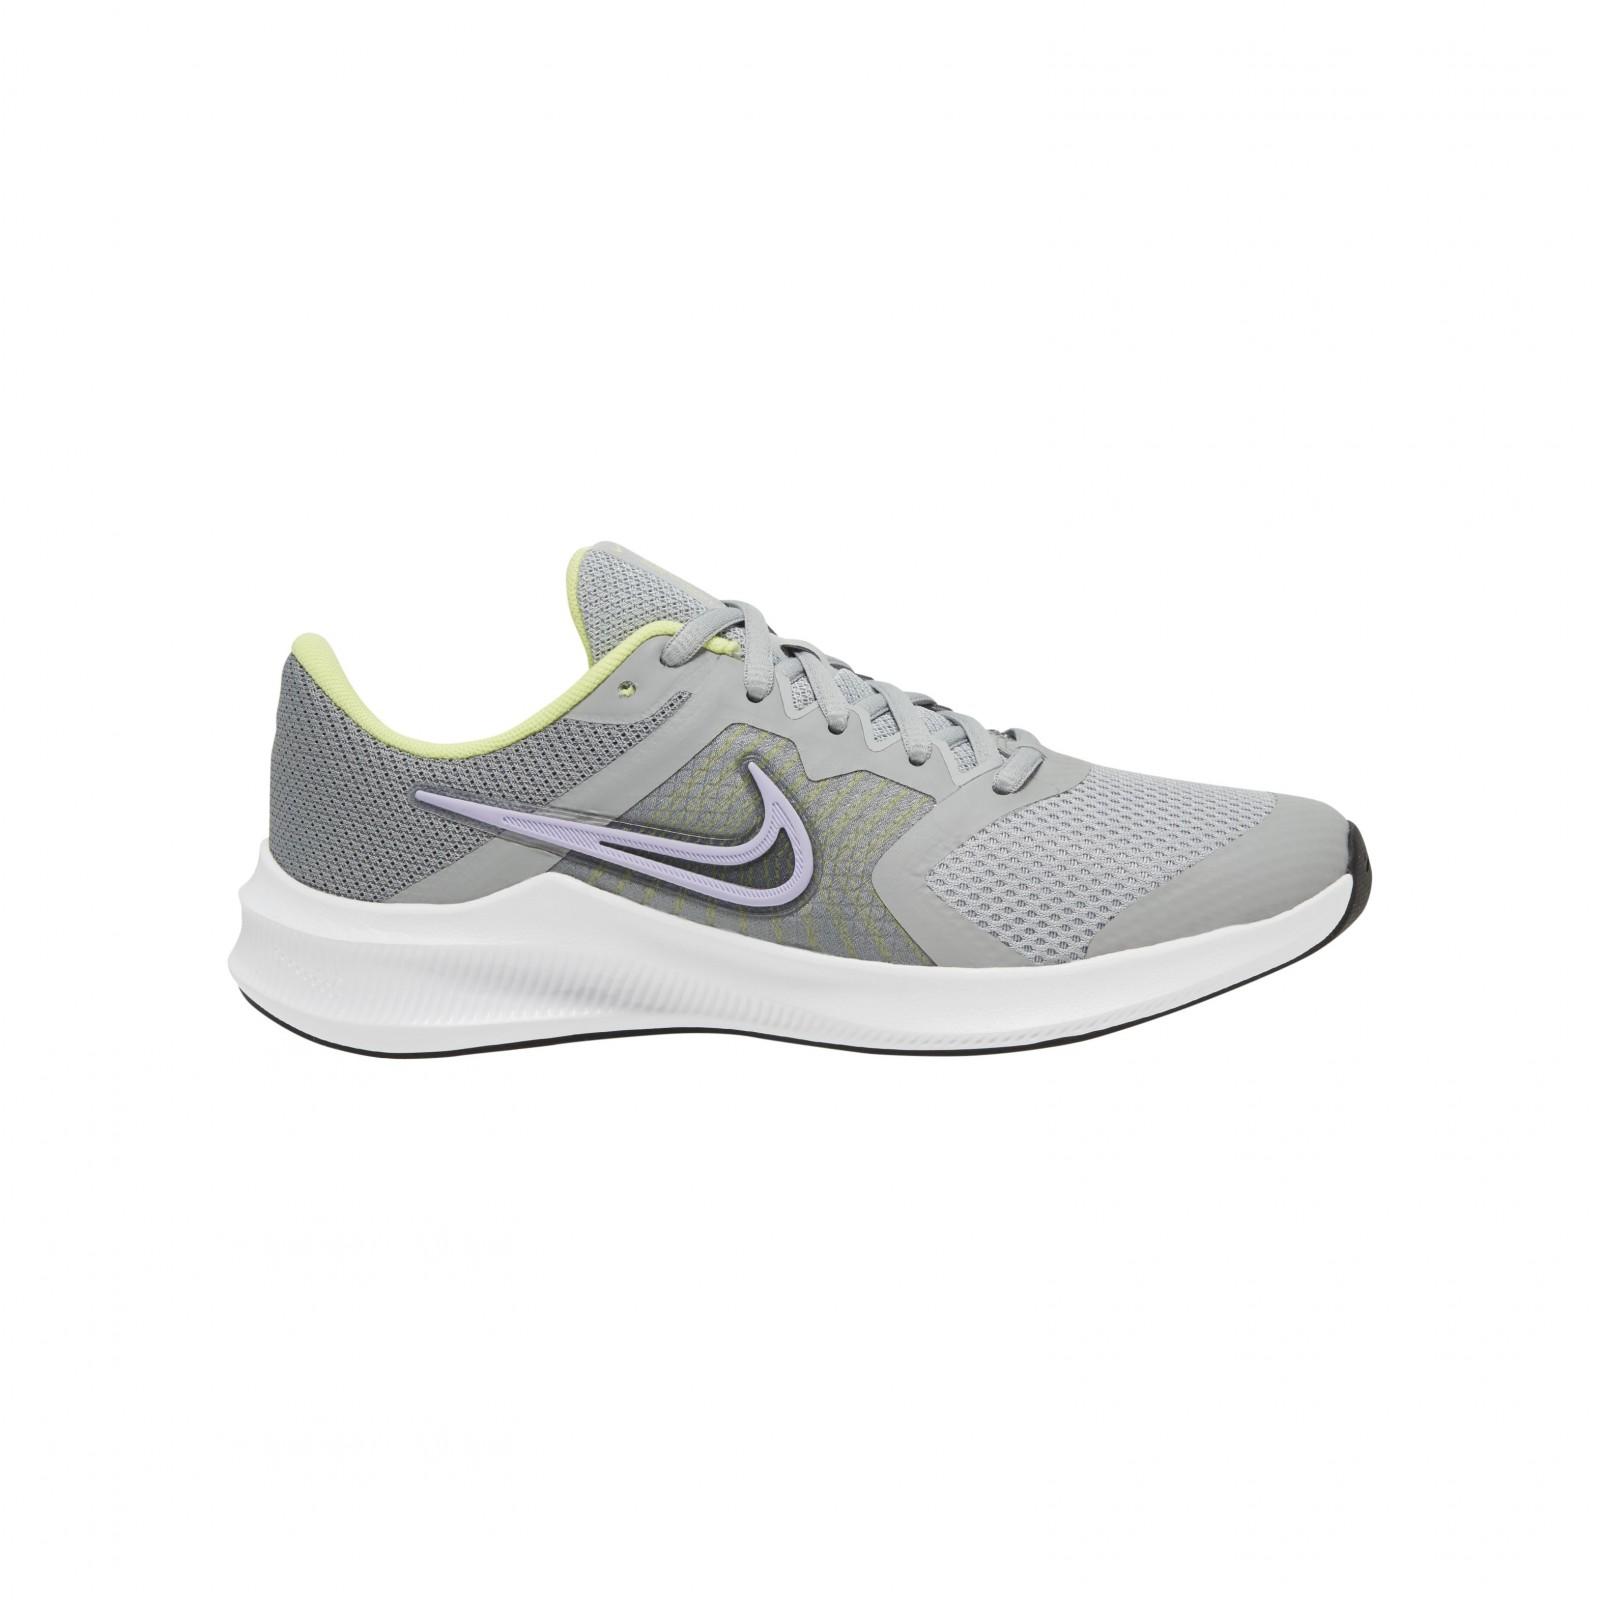 Nike Downshifter 11 LT SMOKE GREY/LILAC-LT LEMON TWIST